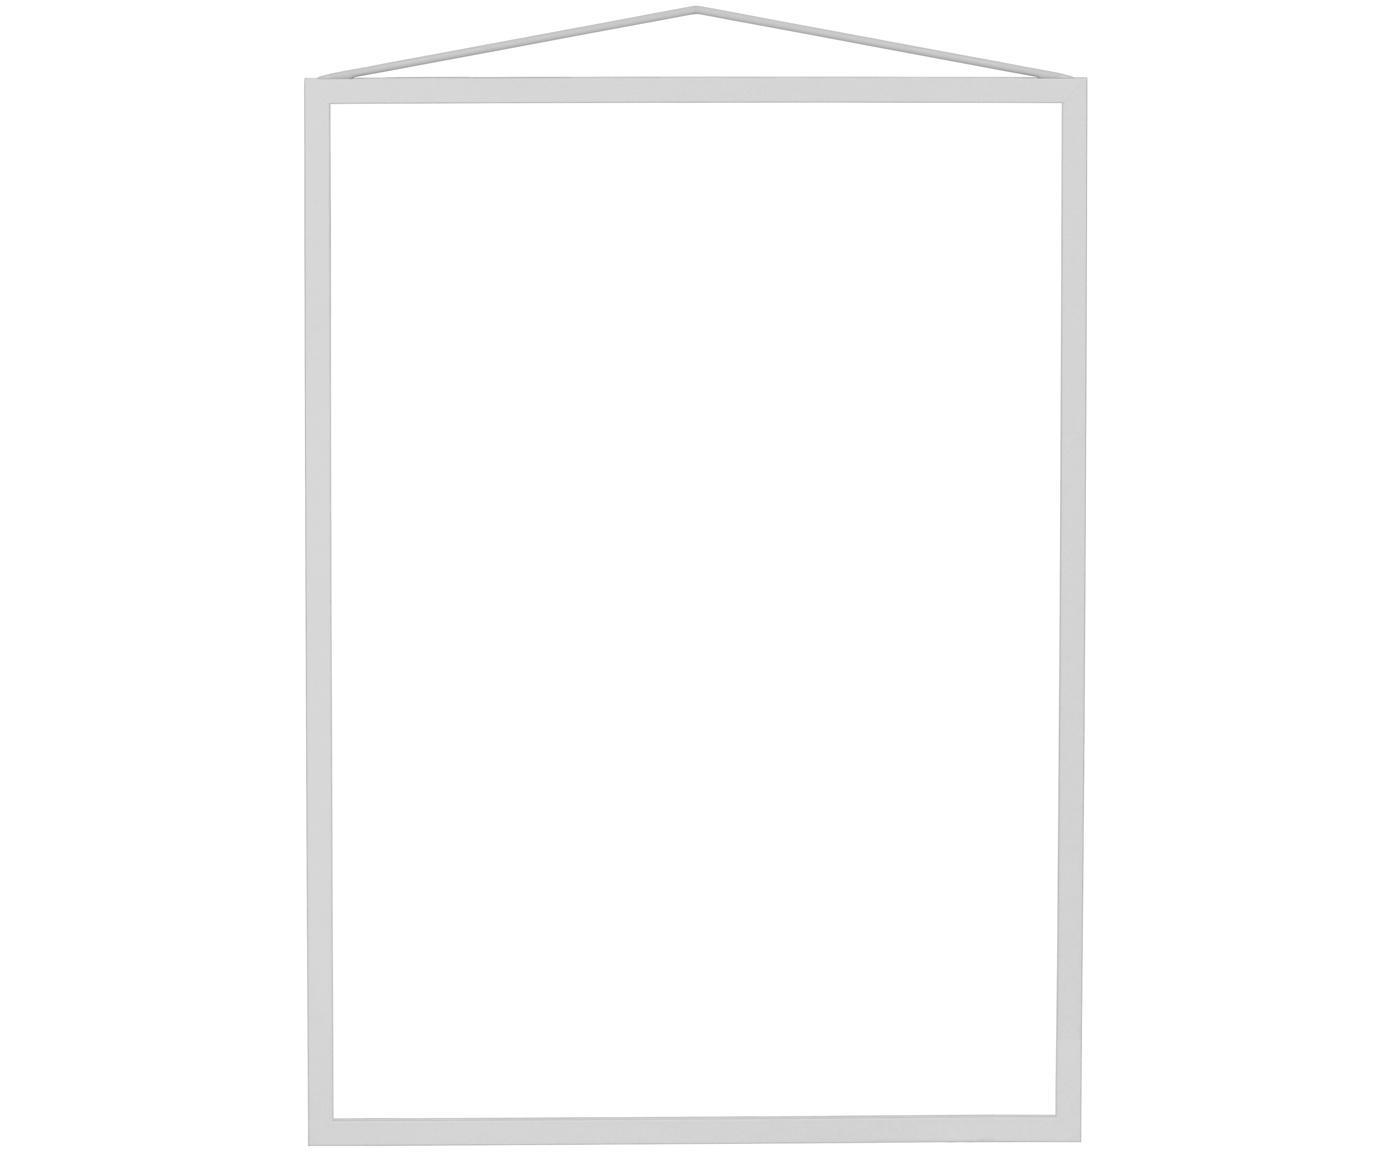 Bilderrahmen Colour Frame, Rahmen: Stahl, pulverbeschichtet, Grau, 30 x 42 cm